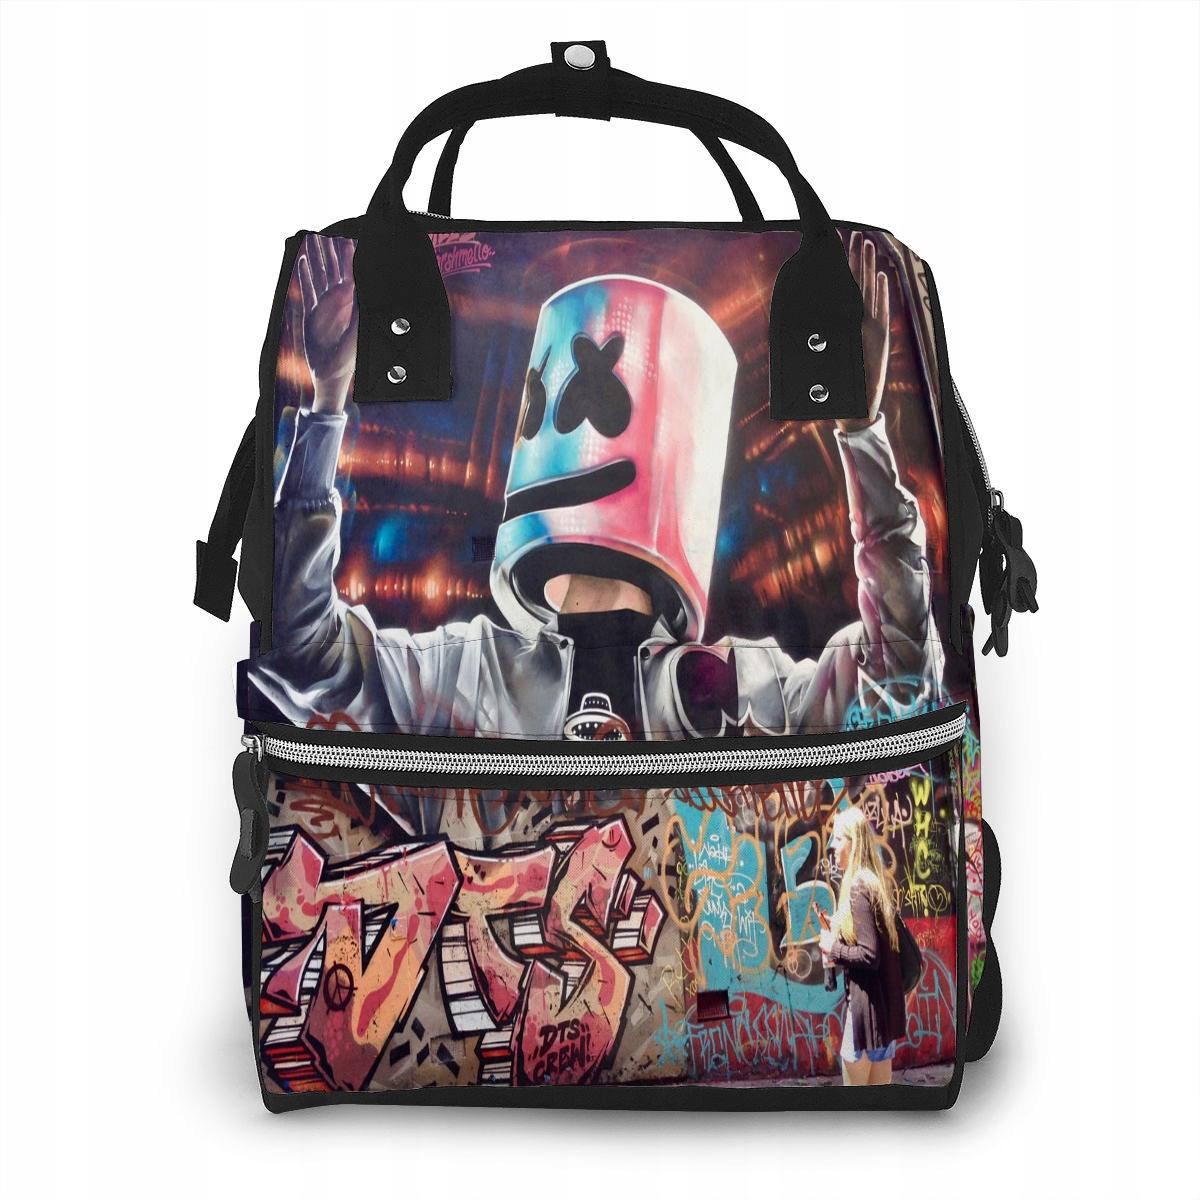 Materská školská taška Ybn-701-Y0138 Marshmello 8